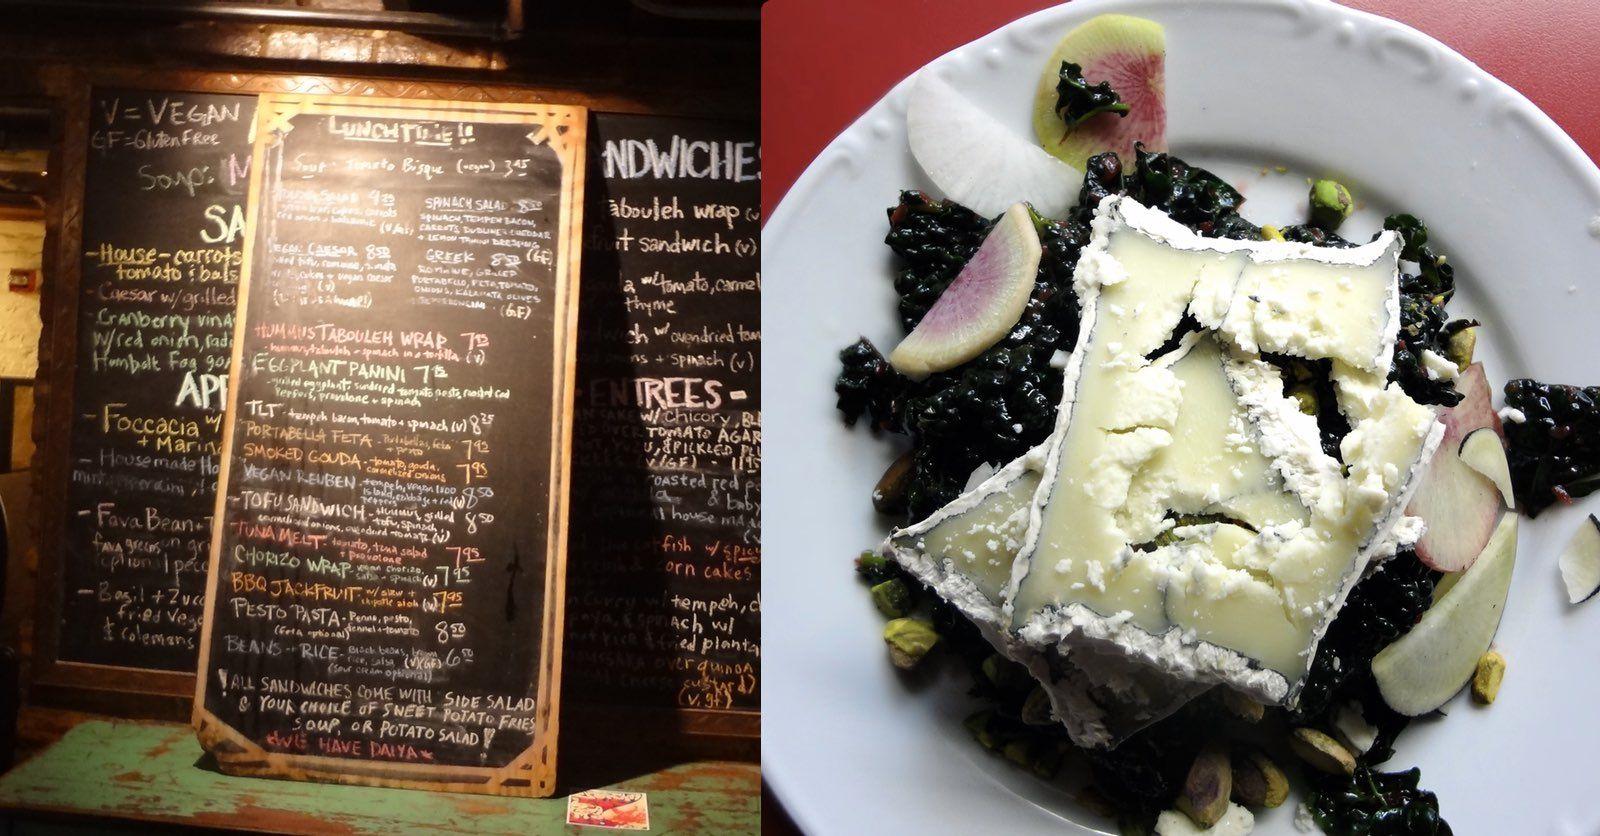 Menu Ipanema Cafe Vegan Restaurants Vegetarian Restaurant Food Festival